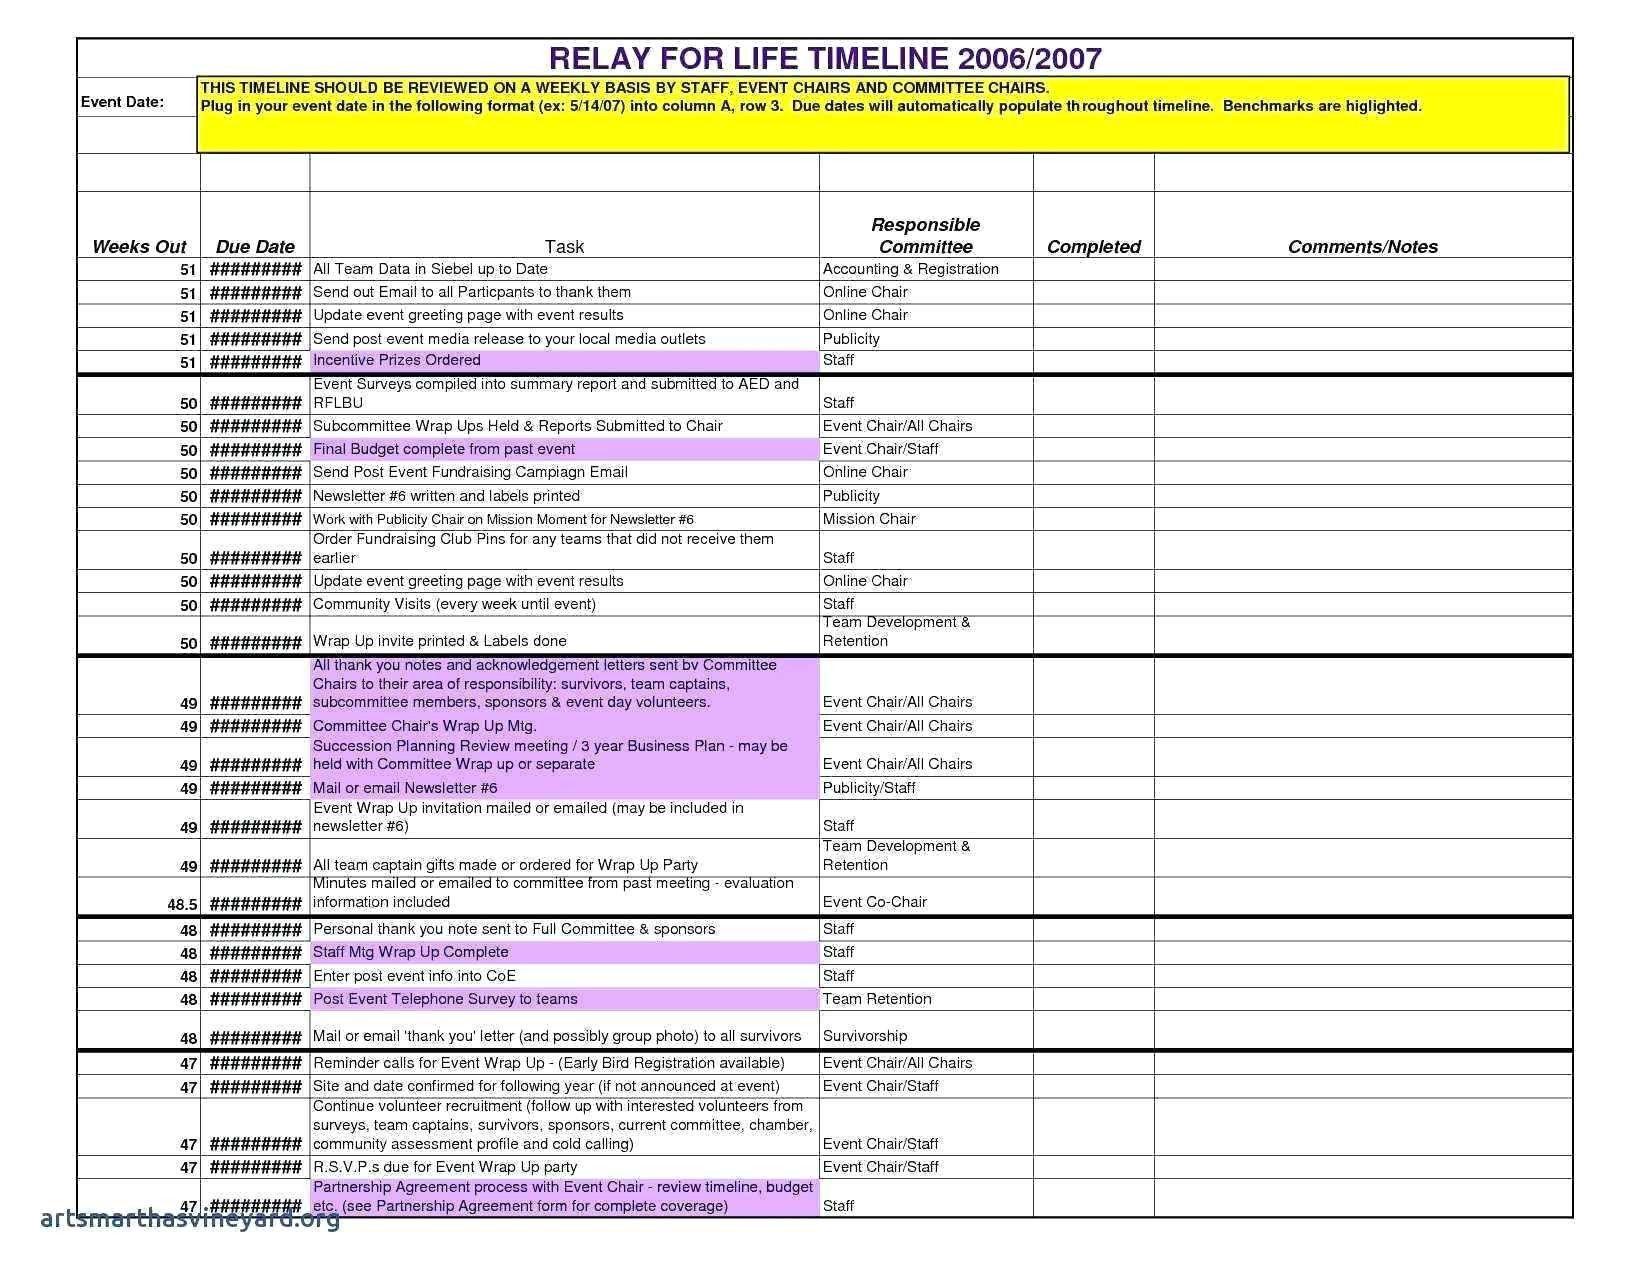 New Sample Project Timeline In Excel Event Planning Timeline